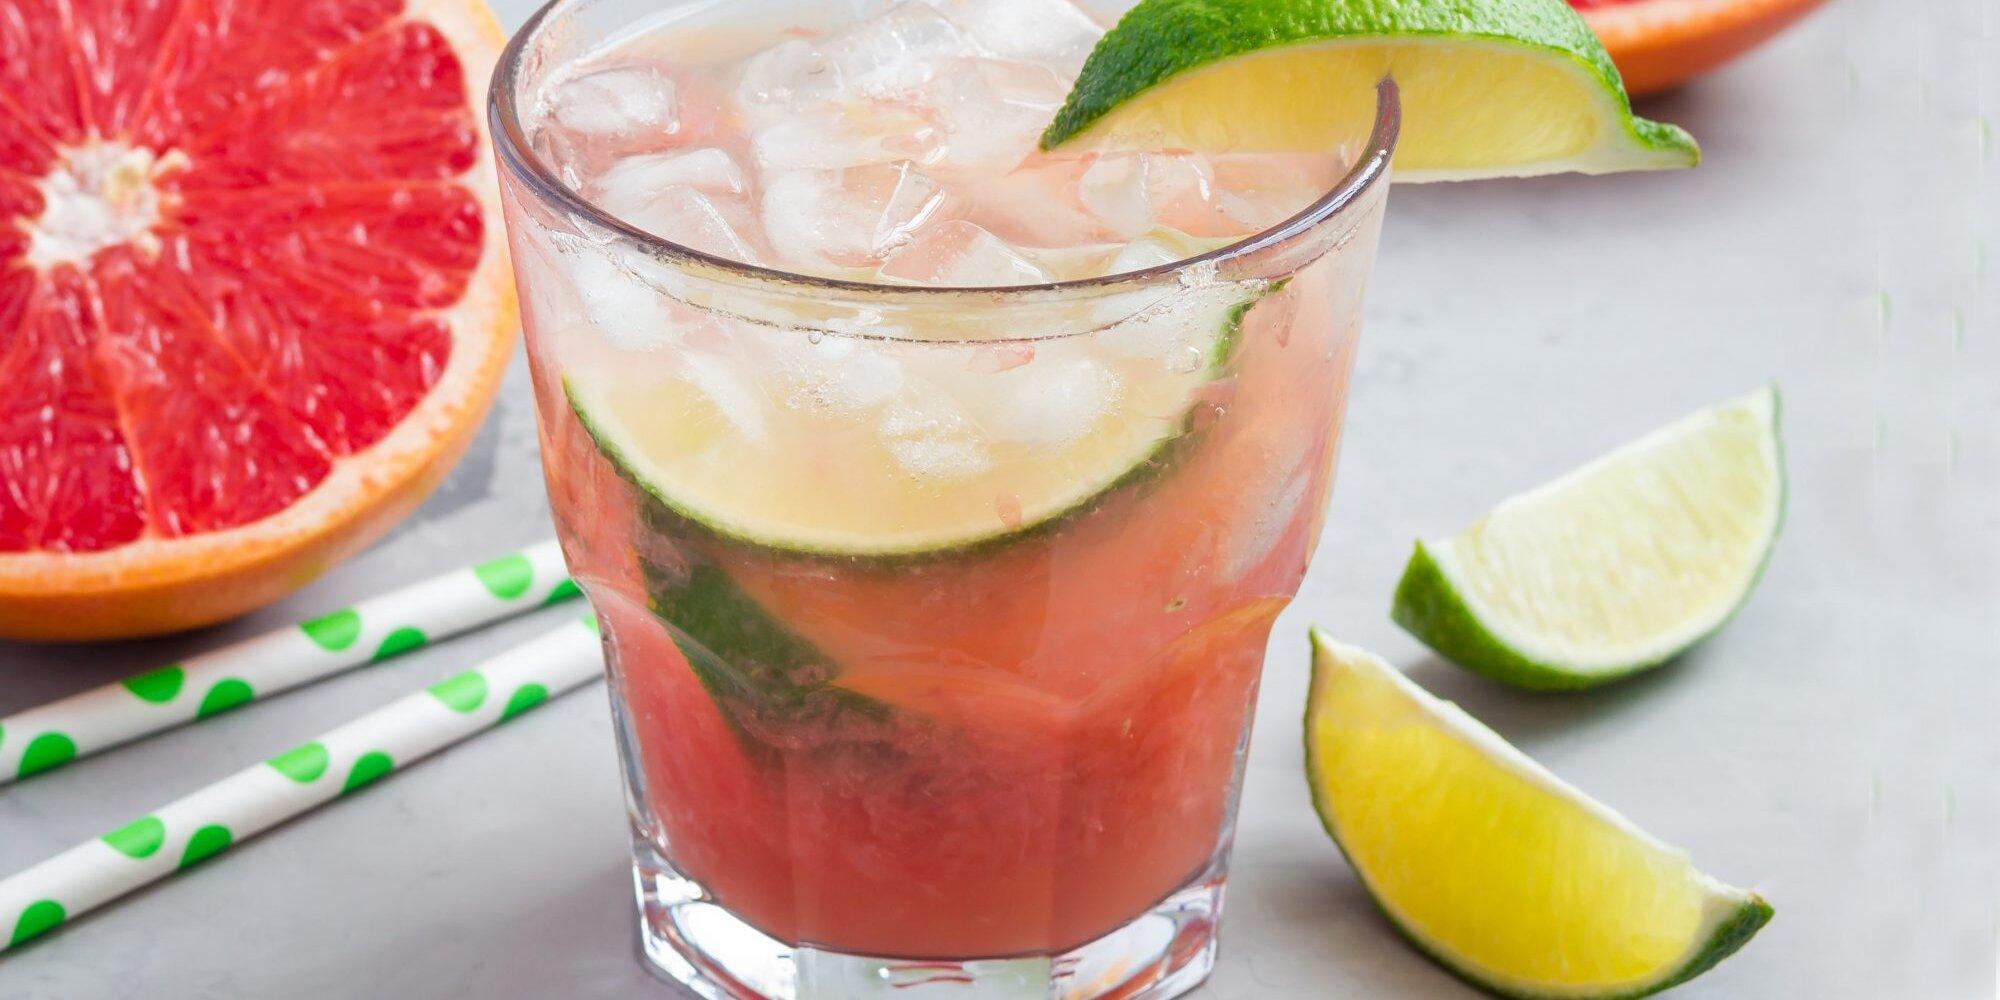 Partida Passion Fruit Cocktail photo